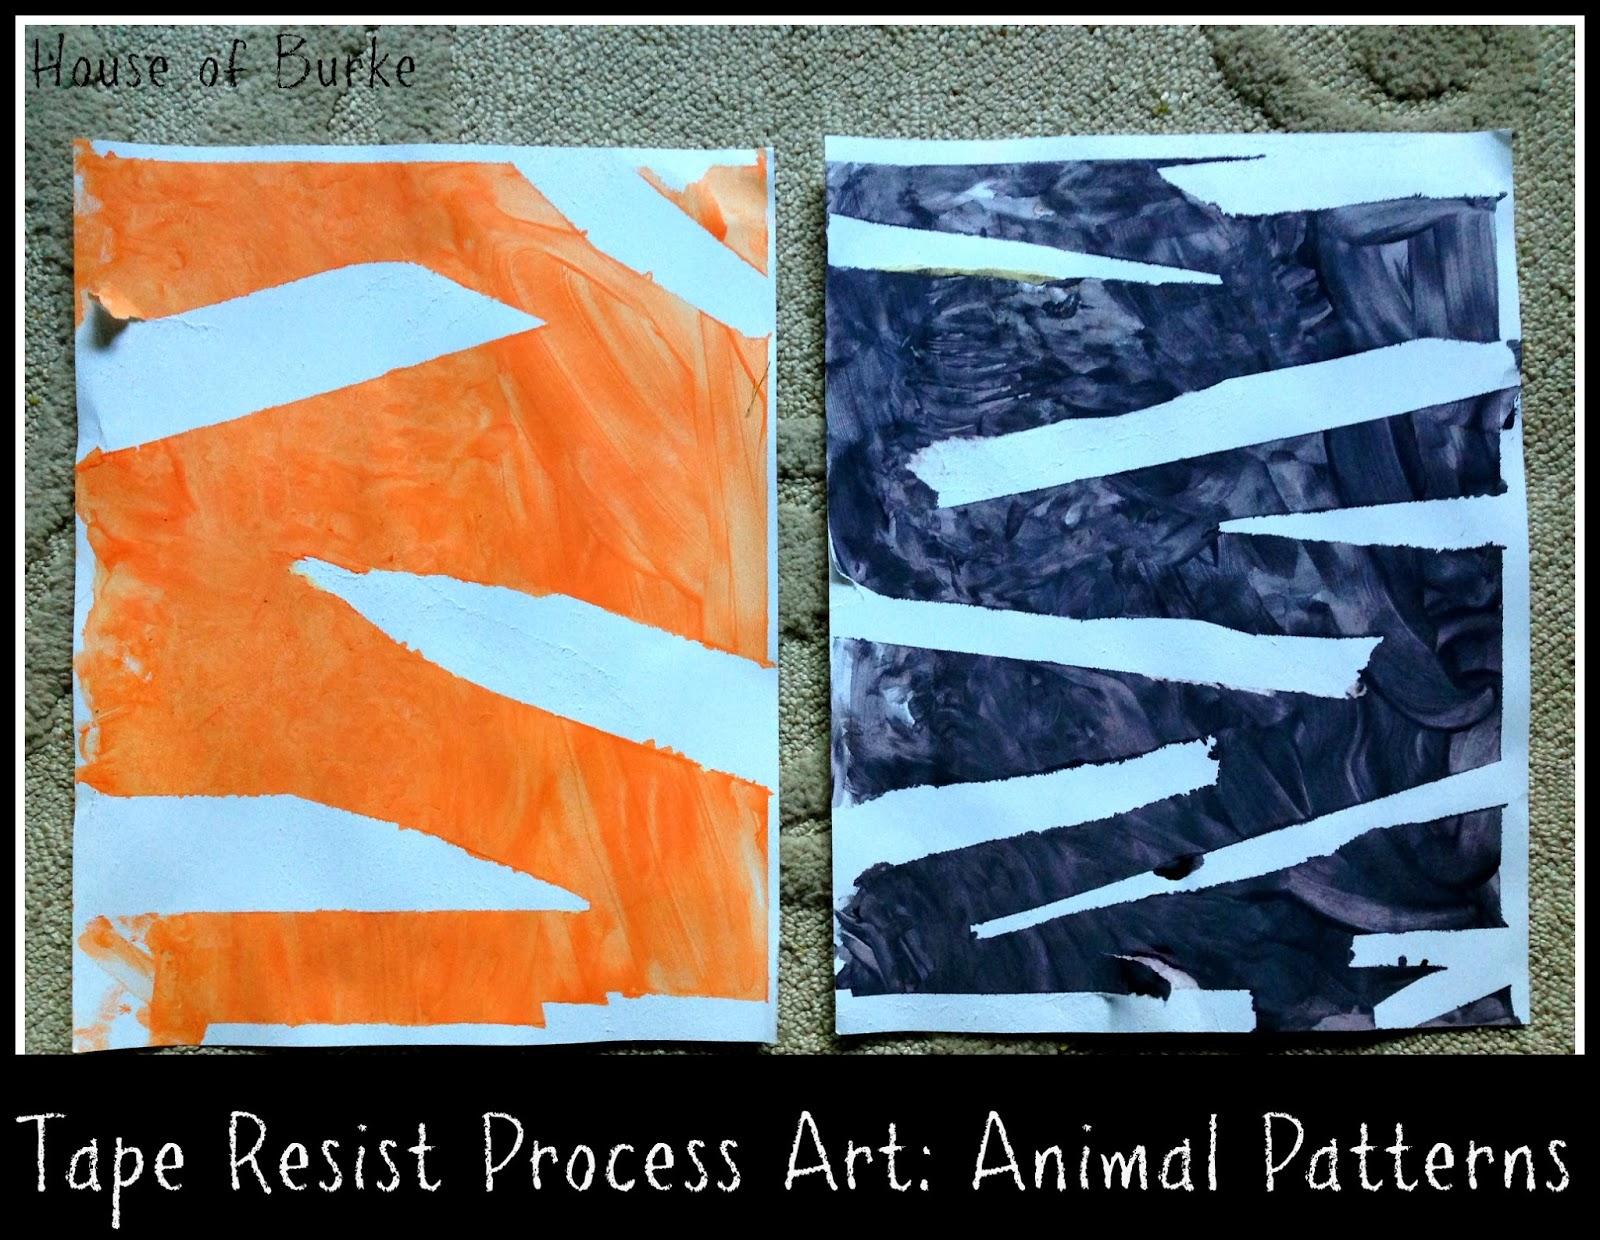 House Of Burke Tape Resist Process Art Creating Animal Patterns